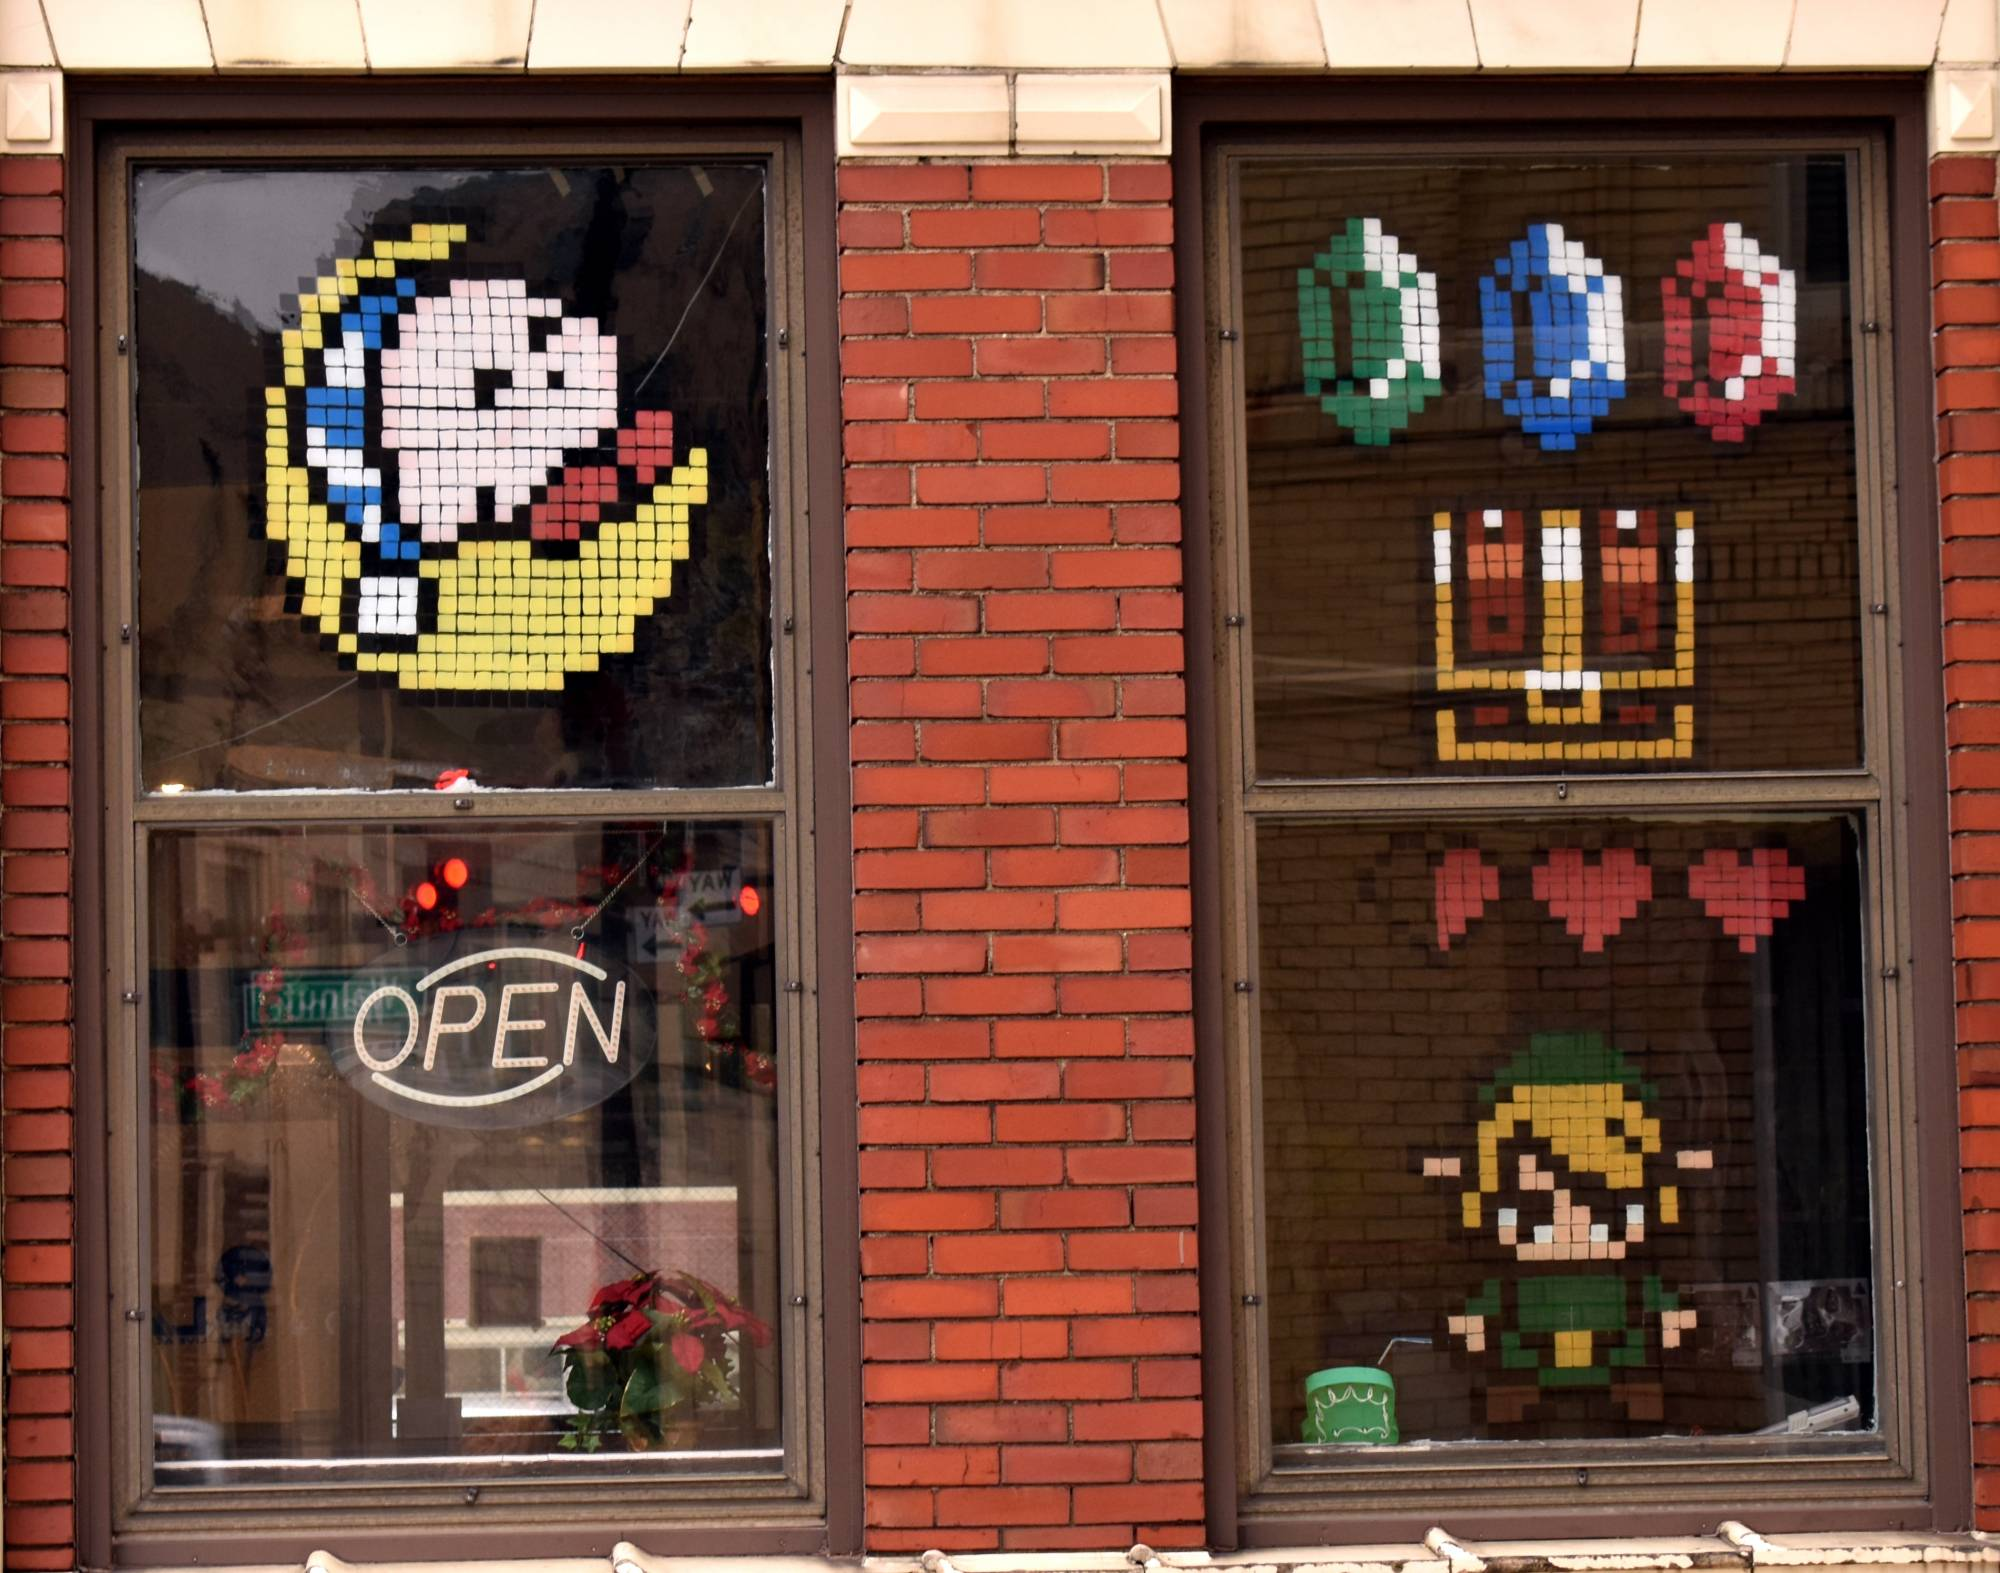 Pixel art on windows